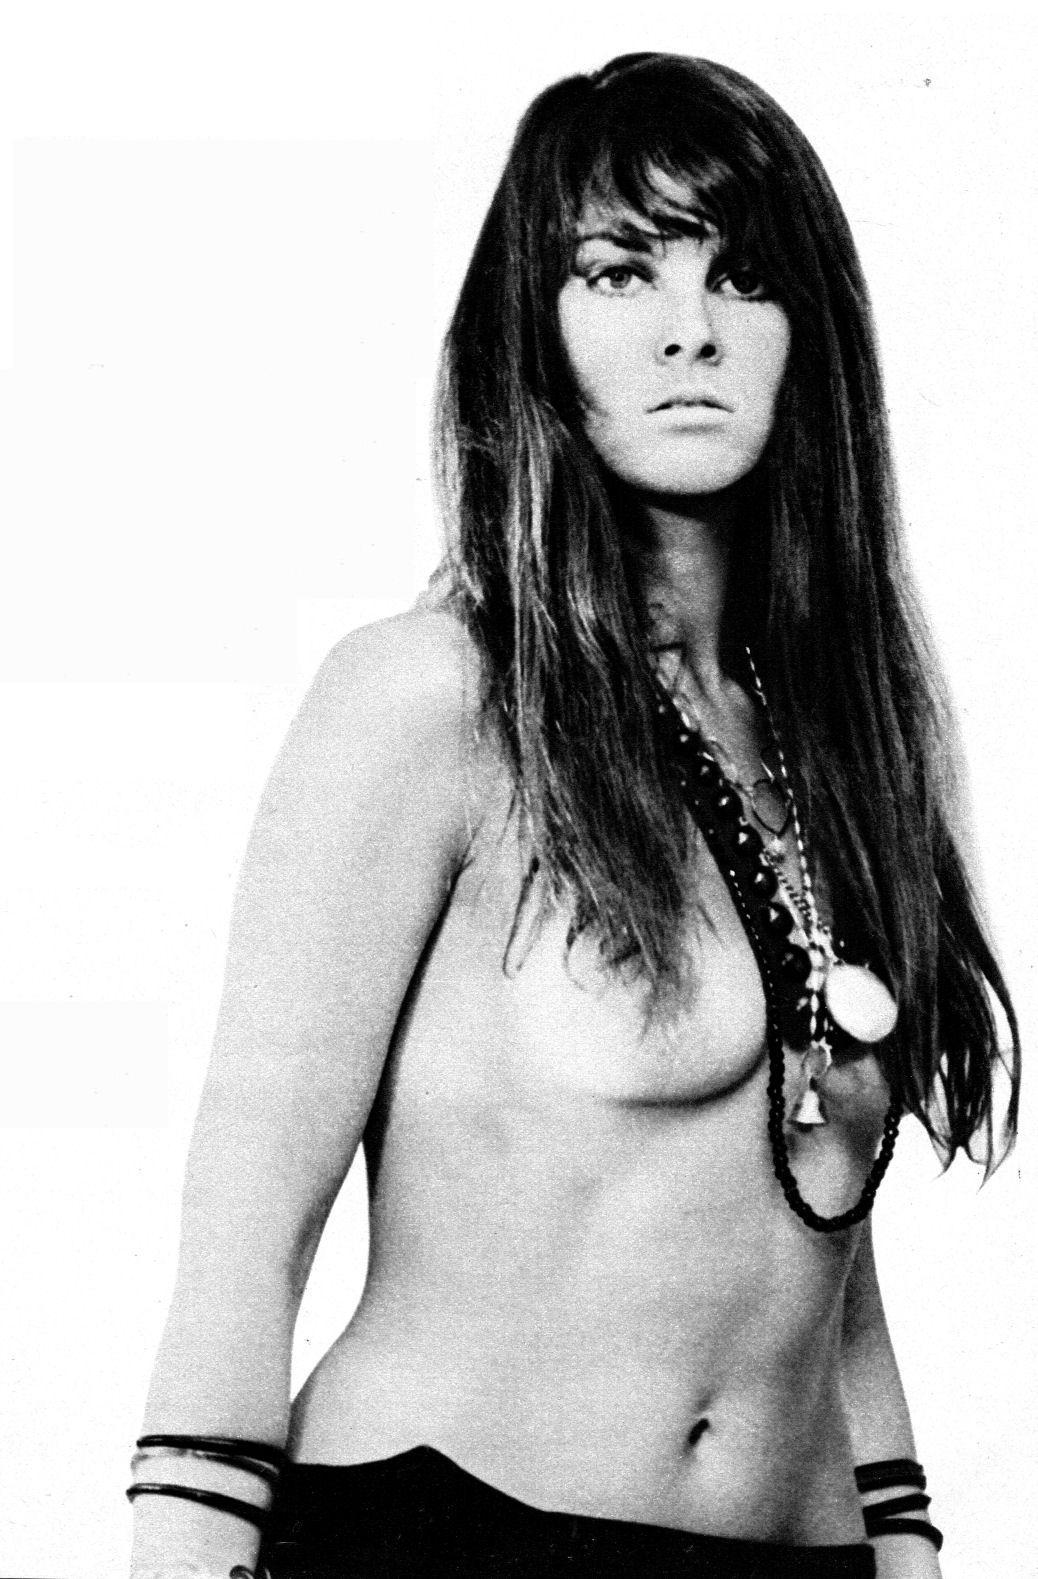 Carmella decesare nude pic